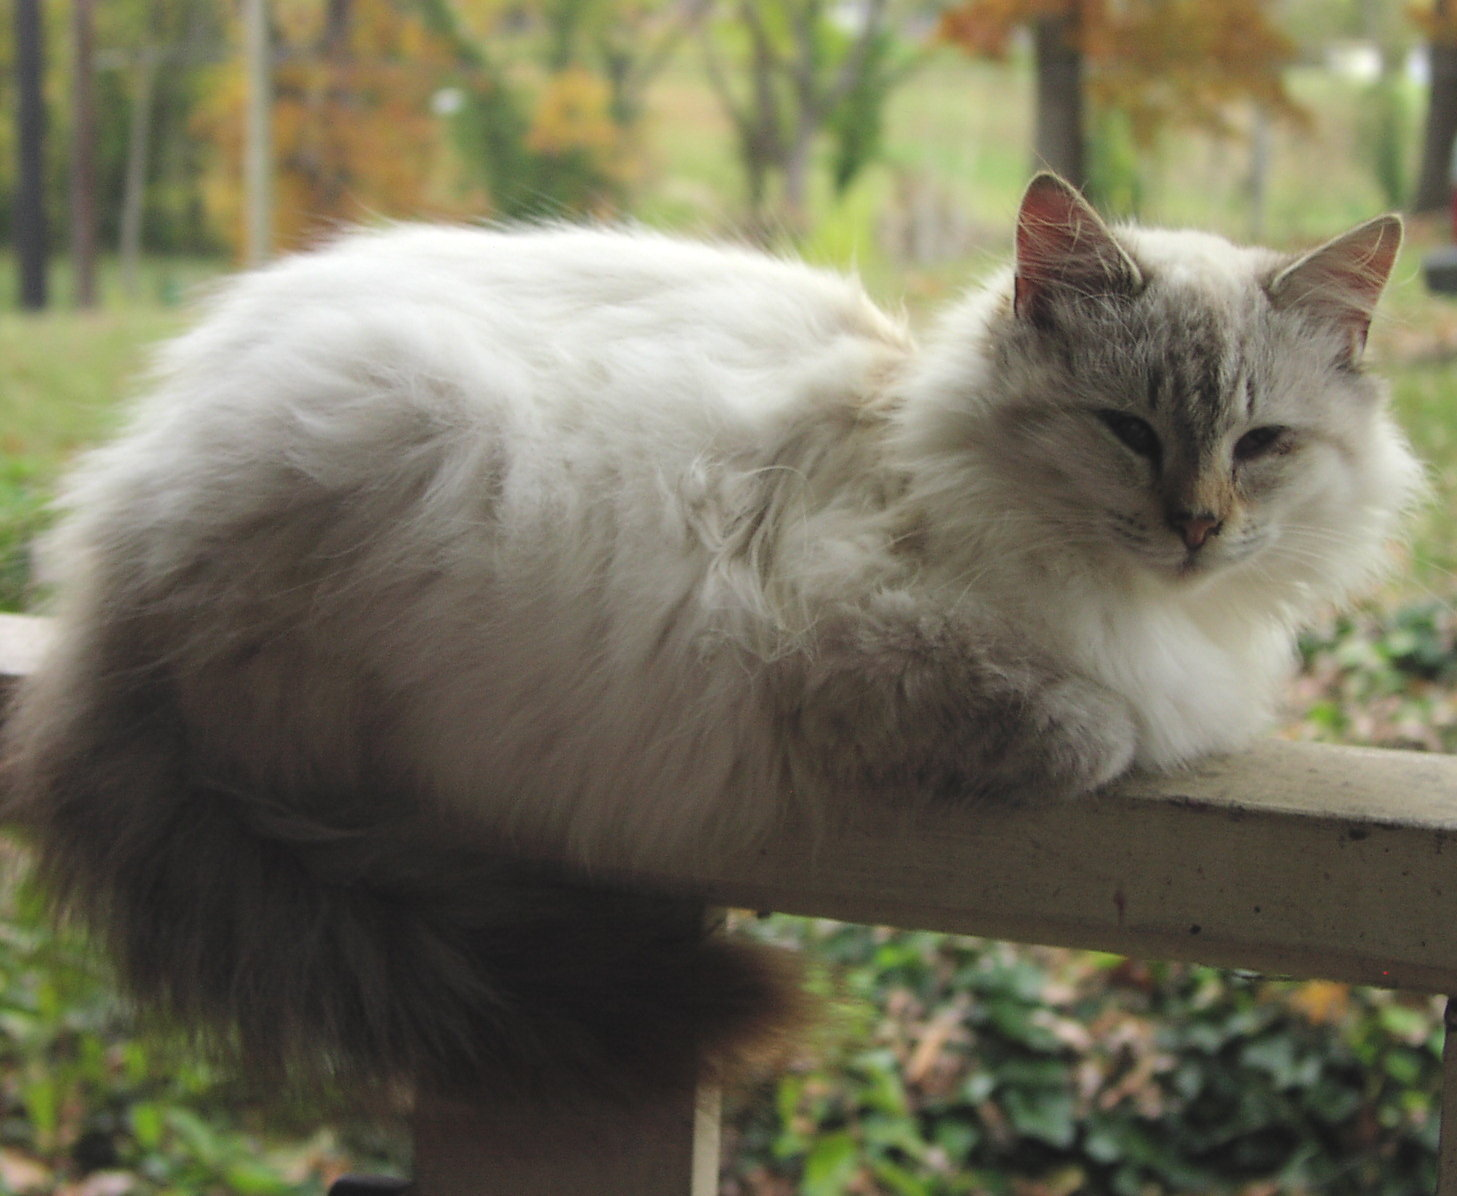 http://www.picgifs.com/wallpapers/wallpapers/cats/cat_27.jpg